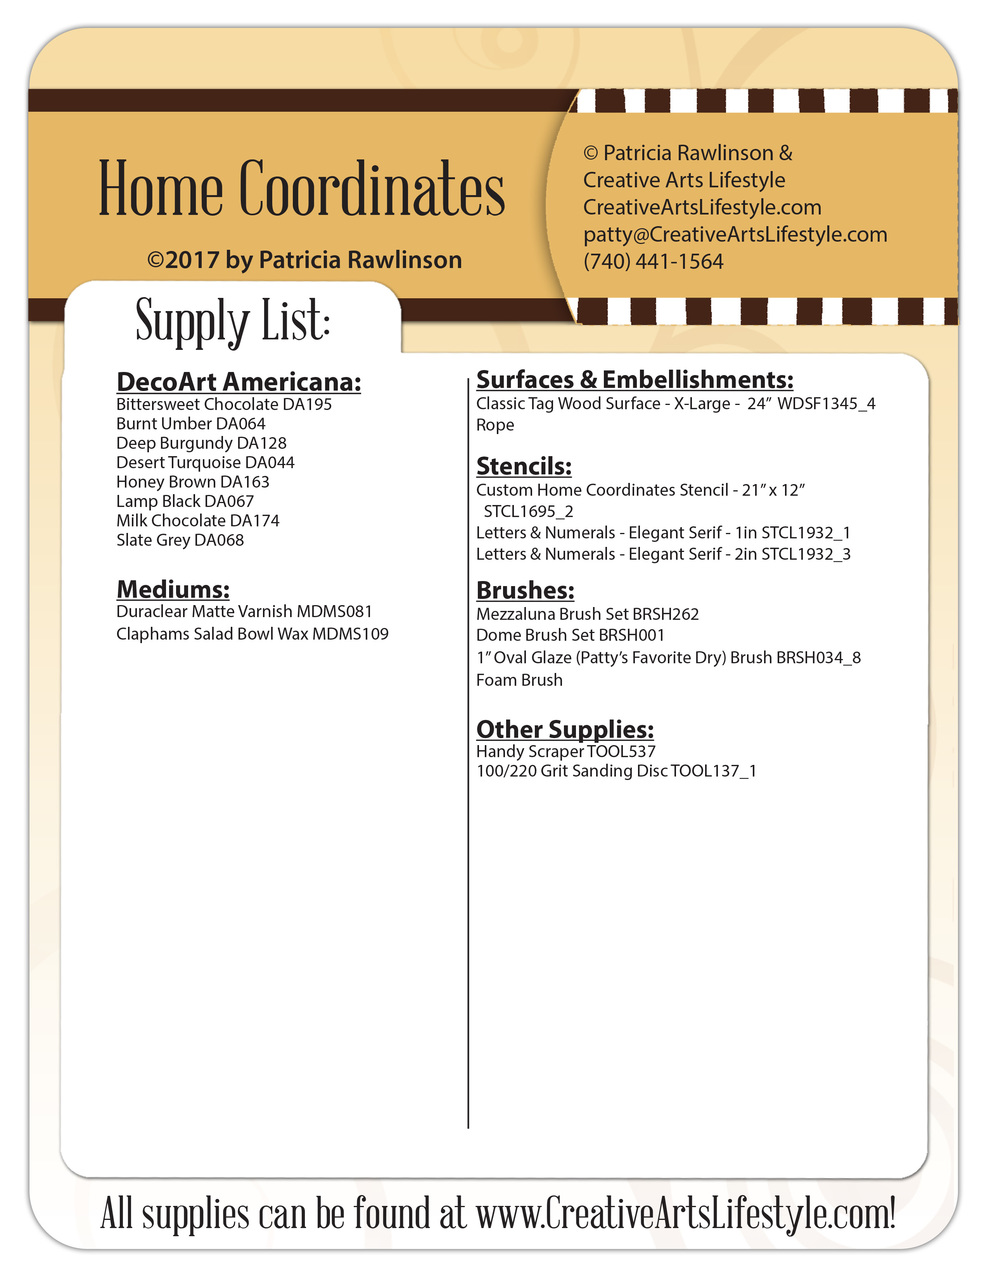 Home Coordinates - E-Packet - Patricia Rawlinson